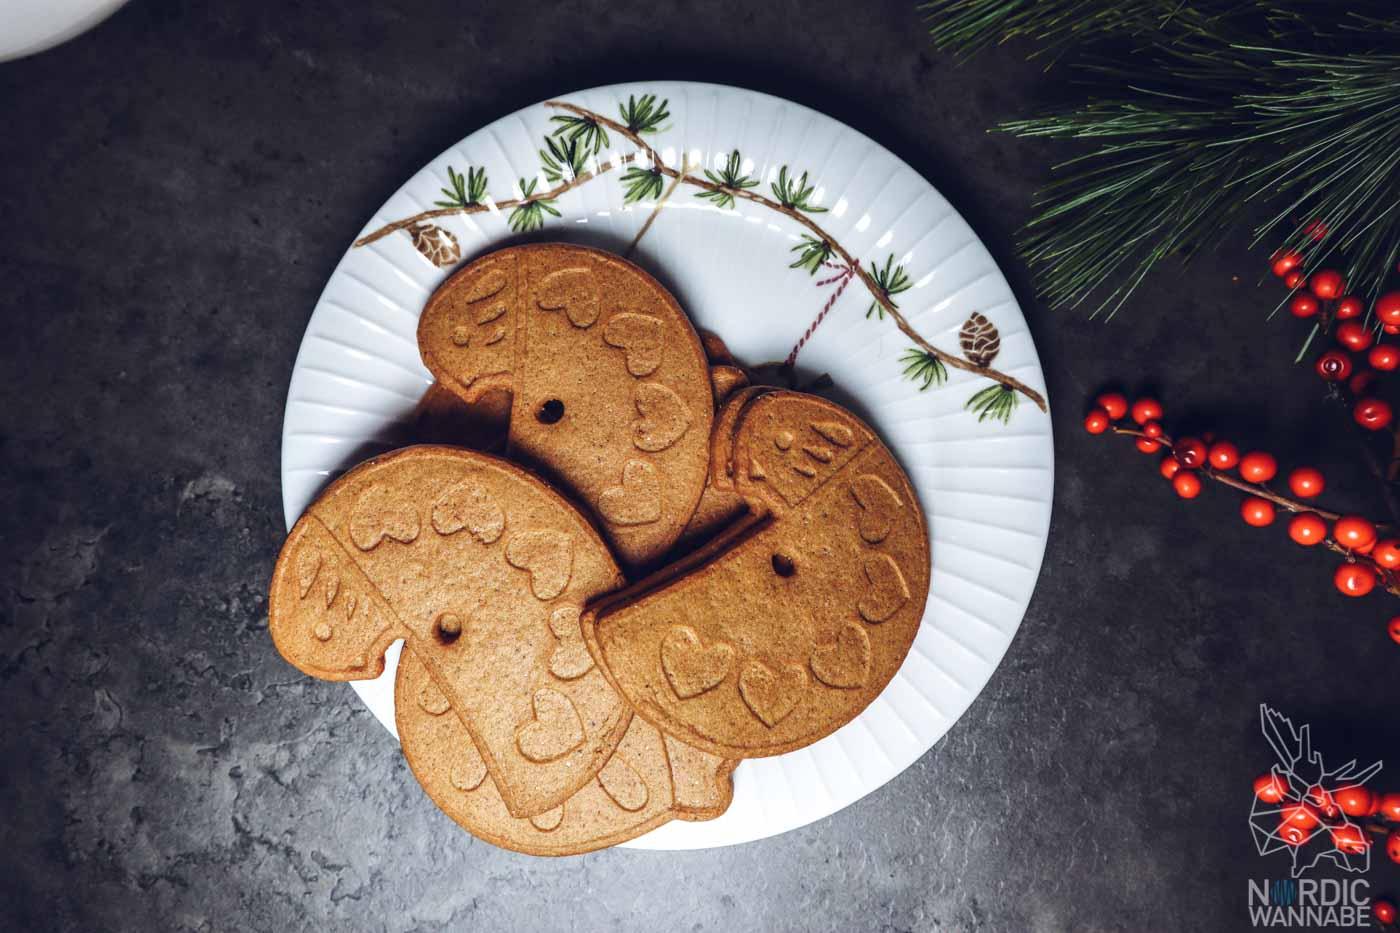 Weihnachtsgeschirr, Kähler, Hammershøi Jul, Weihnachtsteller, Weihnachtstasse, Weihnachtsservice